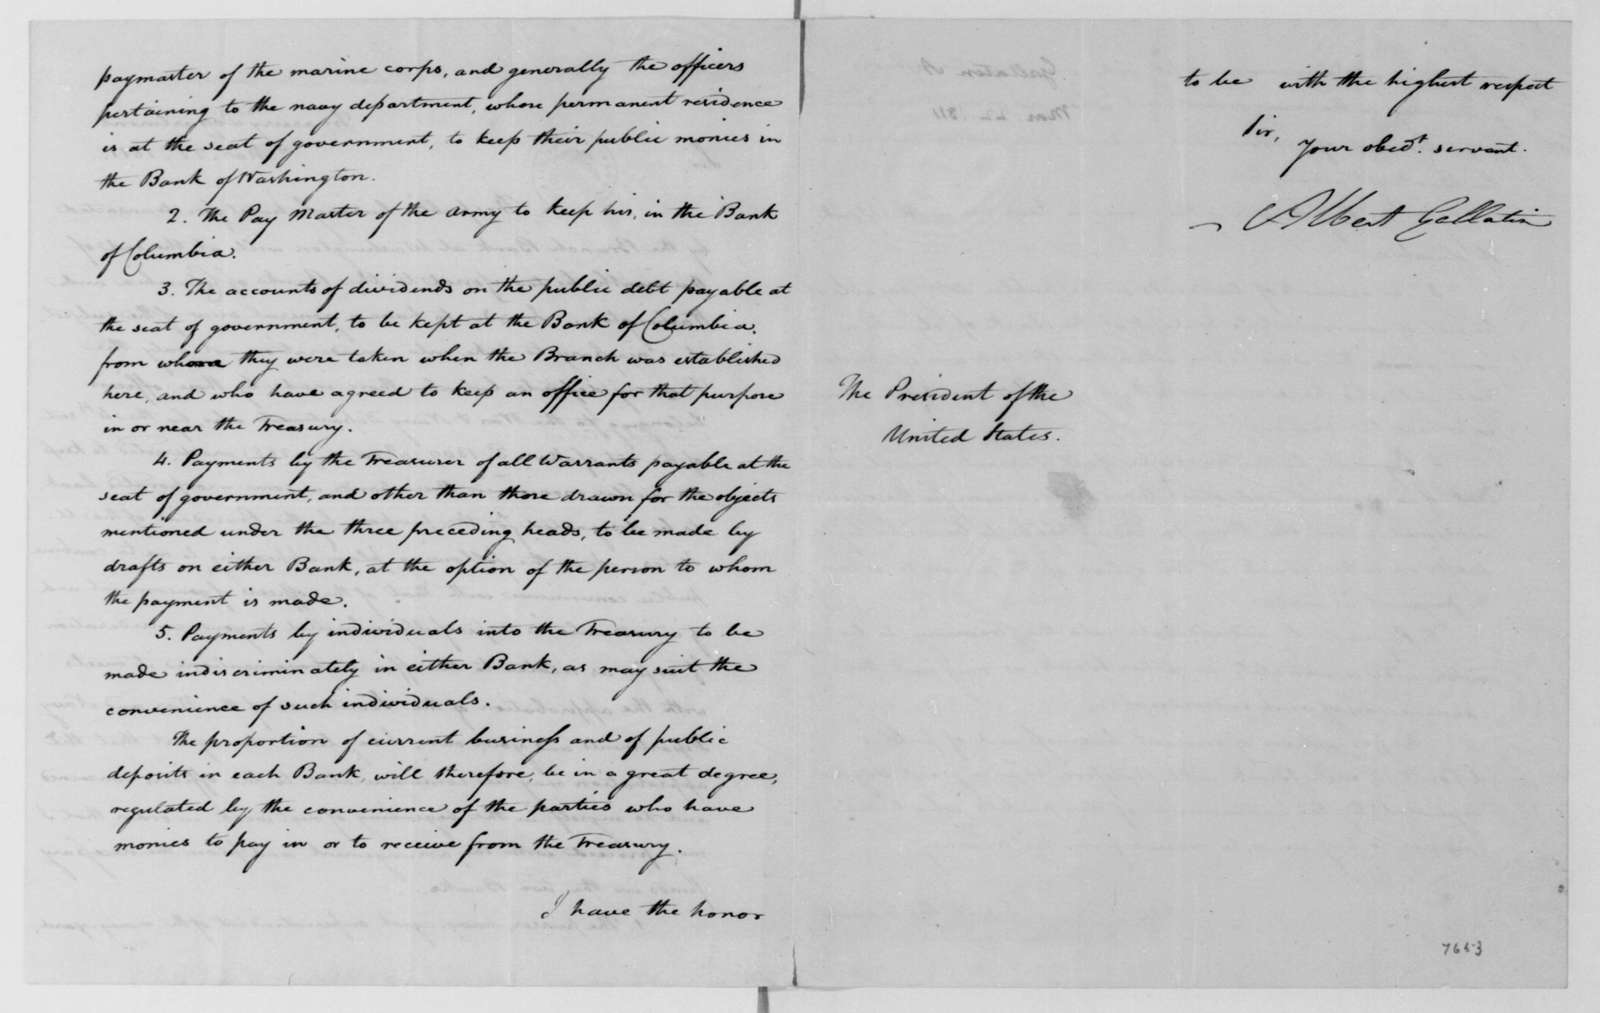 Albert Gallatin to James Madison, March 22, 1811.